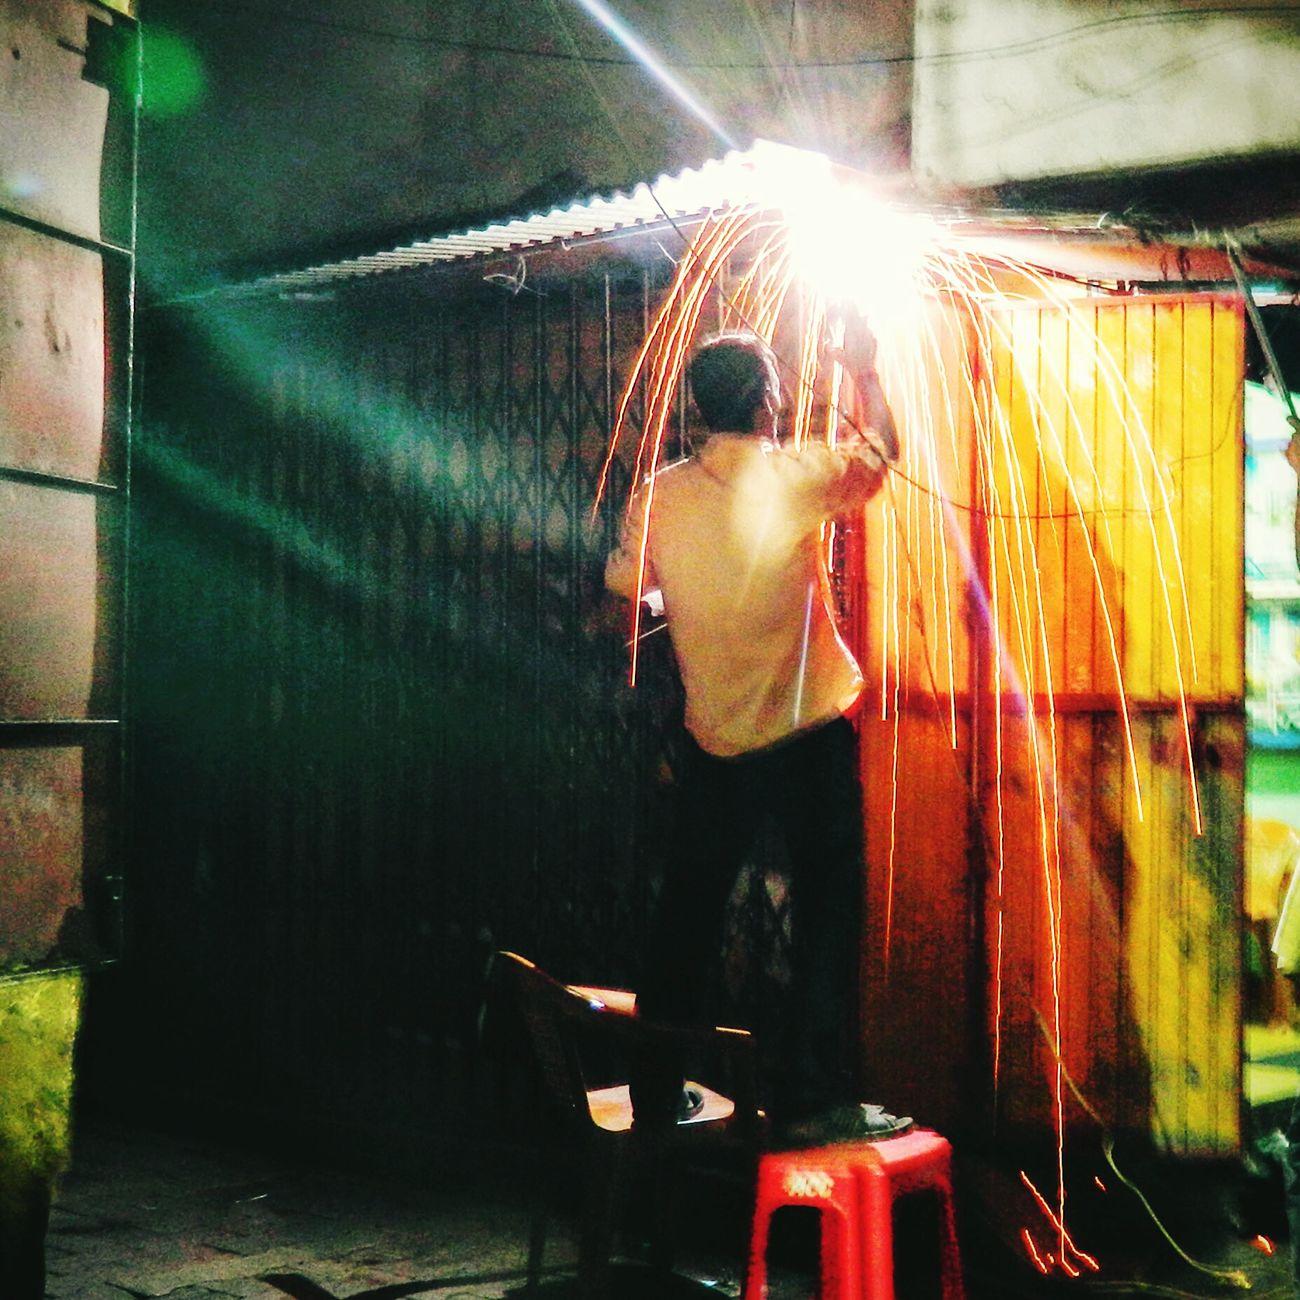 Hard work! Welding Welder Weldinglight Sparks Fly Sparks Exposure